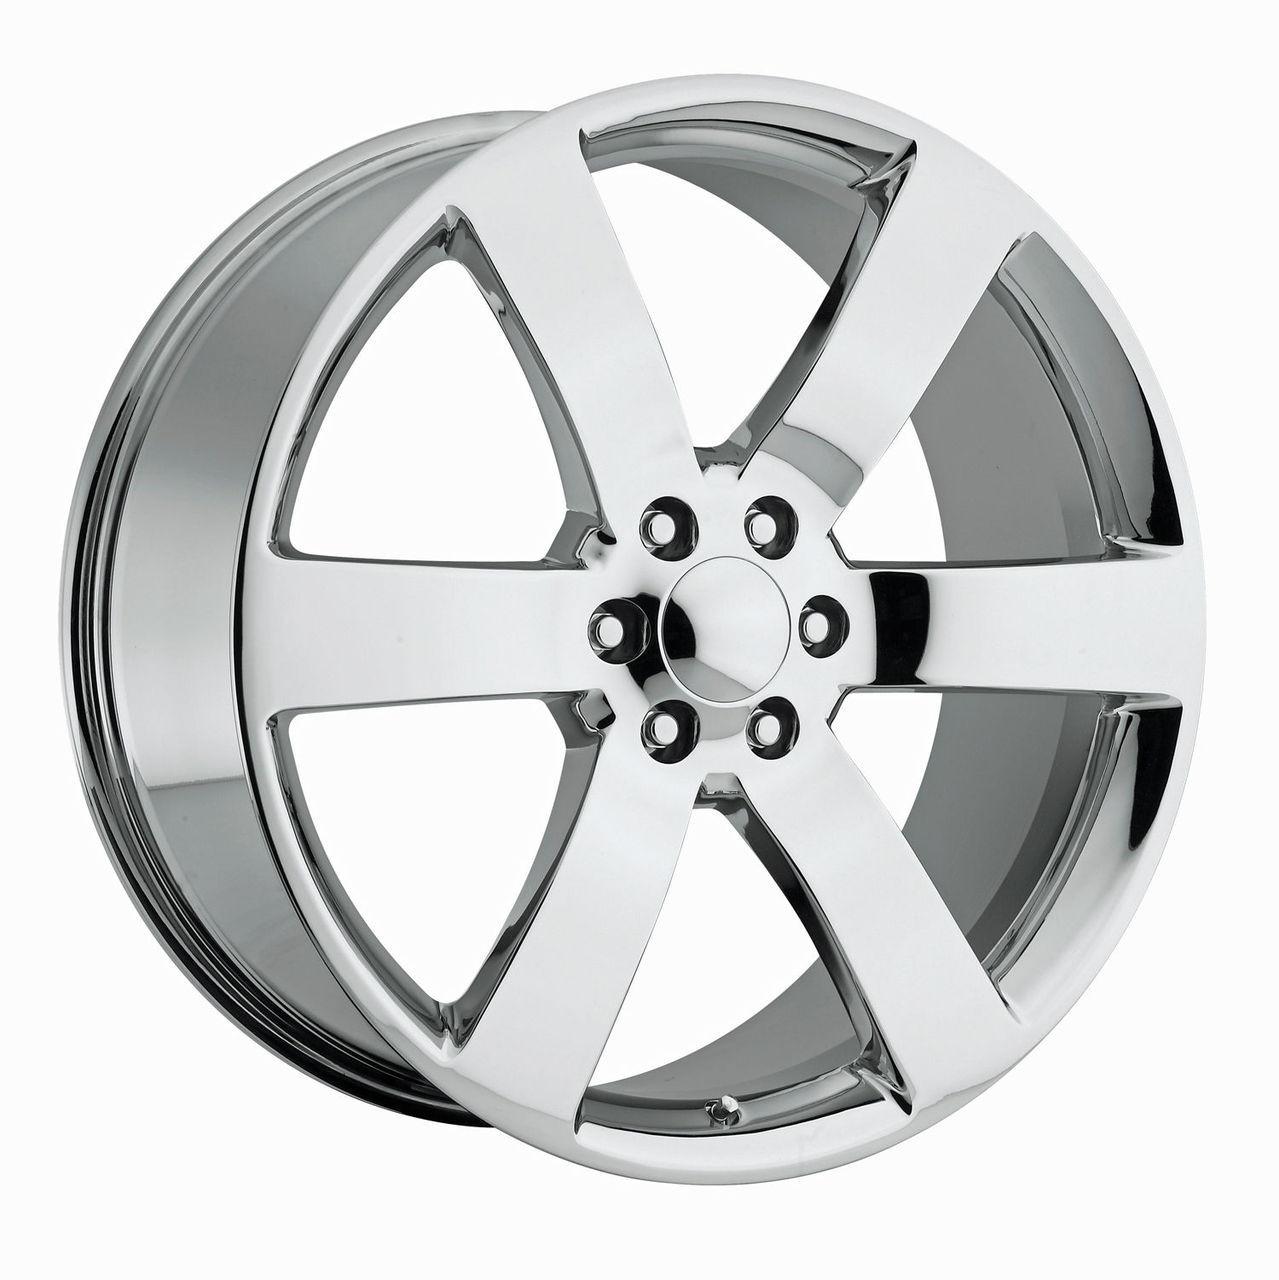 "22"" Chevy Trailblazer SS Style Fits Silverado 1500 Tahoe Wheels Chrome Set of 4 22X9"" Rims ..."